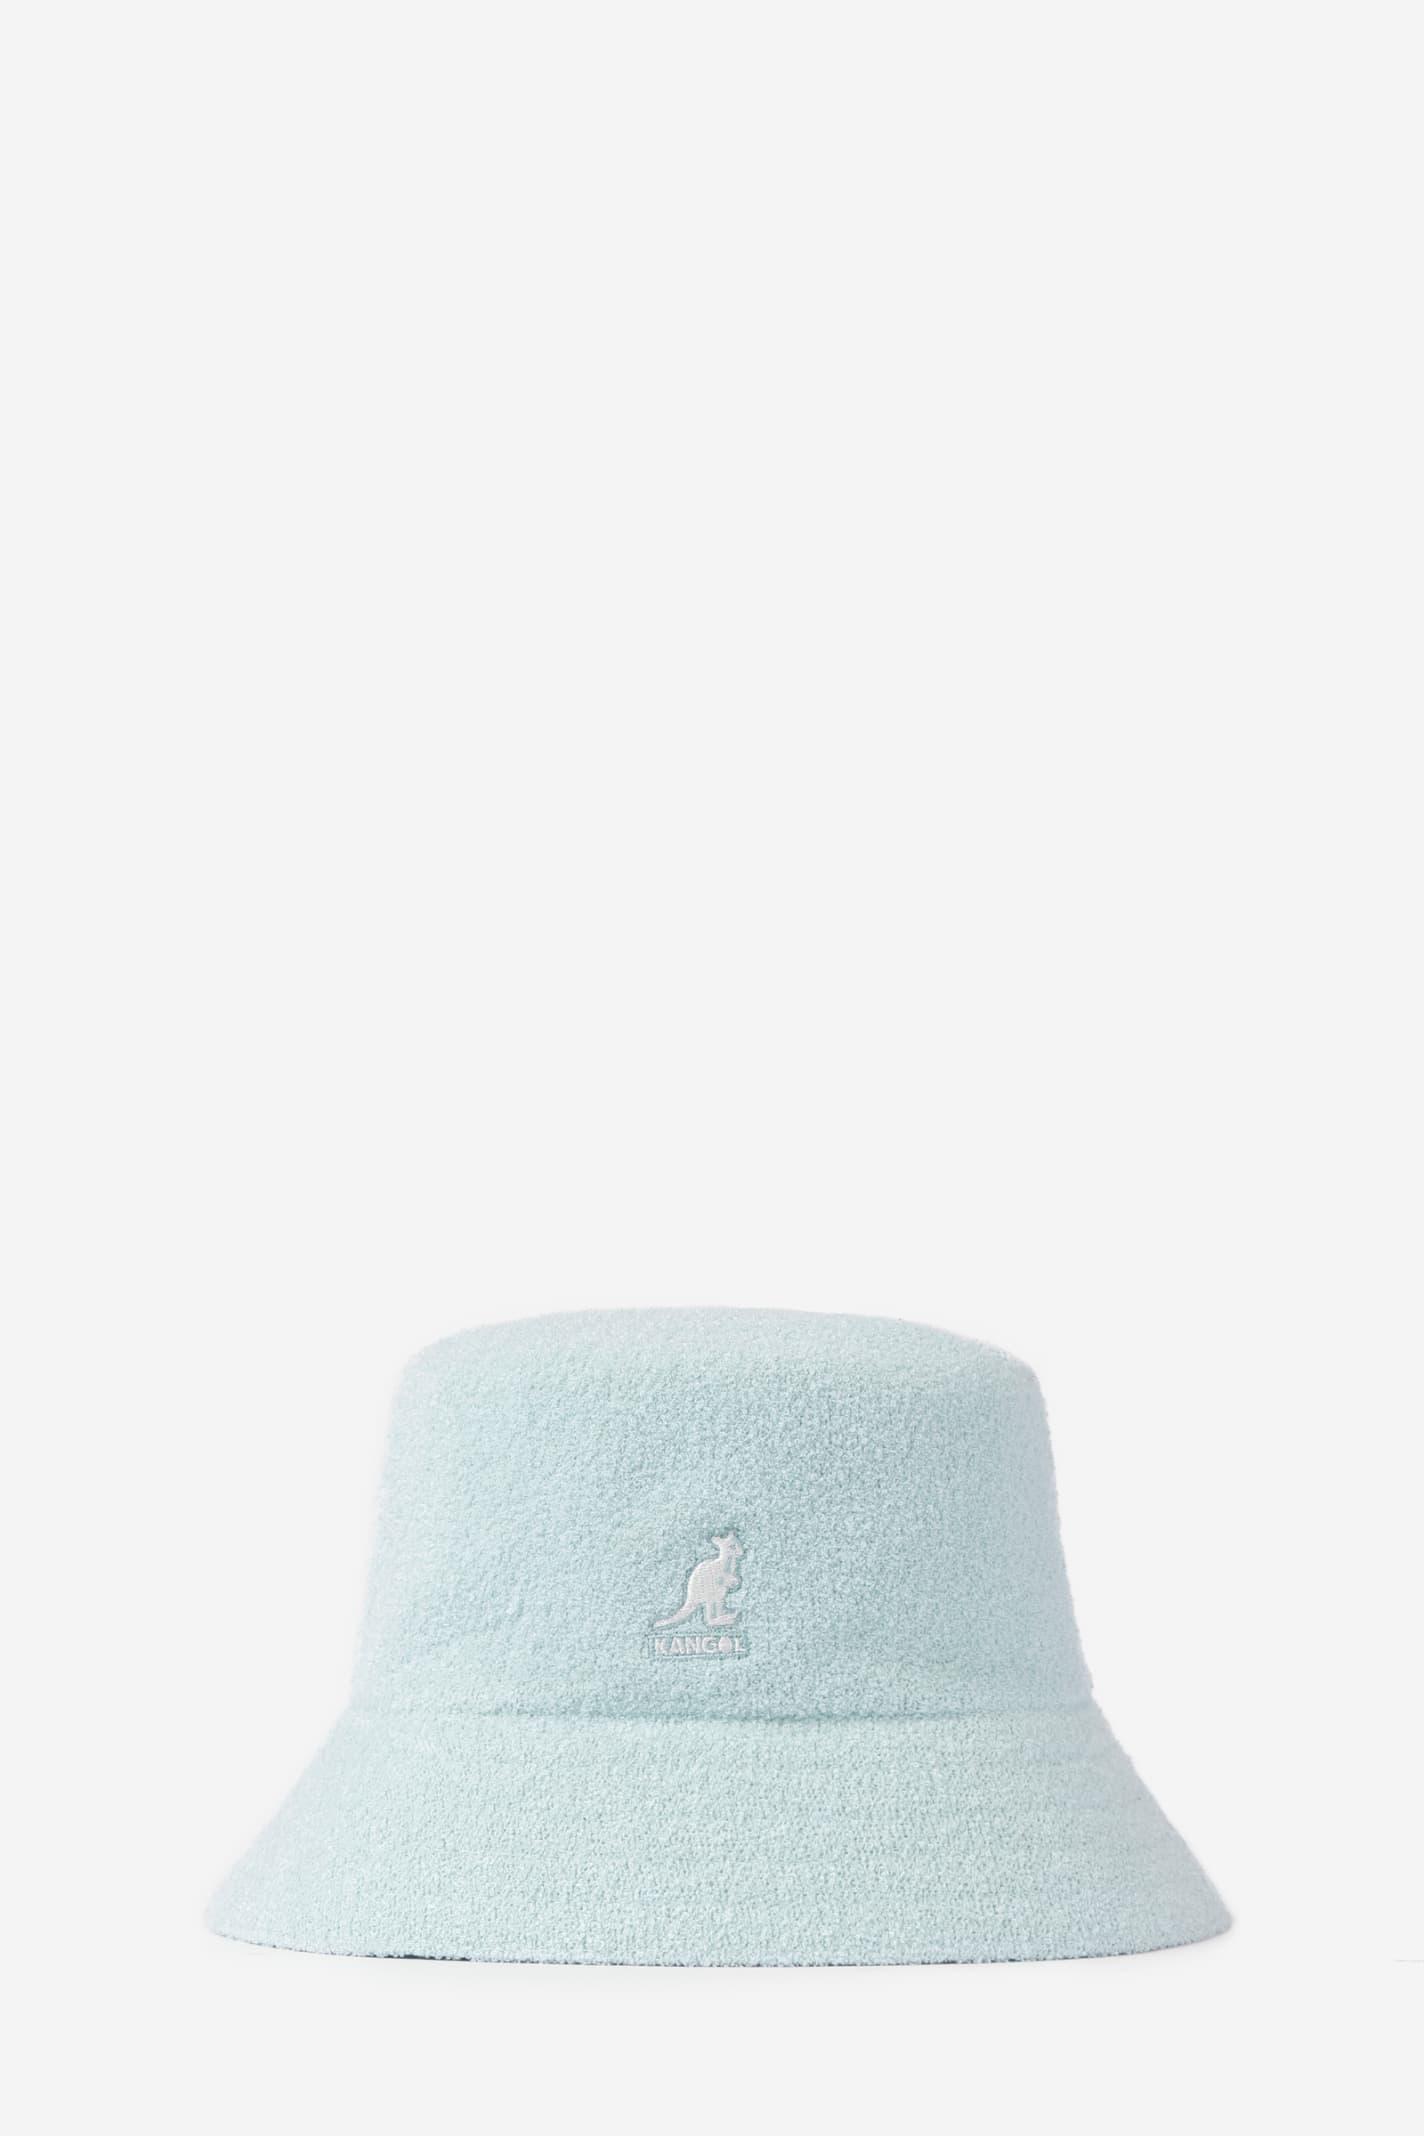 Bermuda Bucket Hats